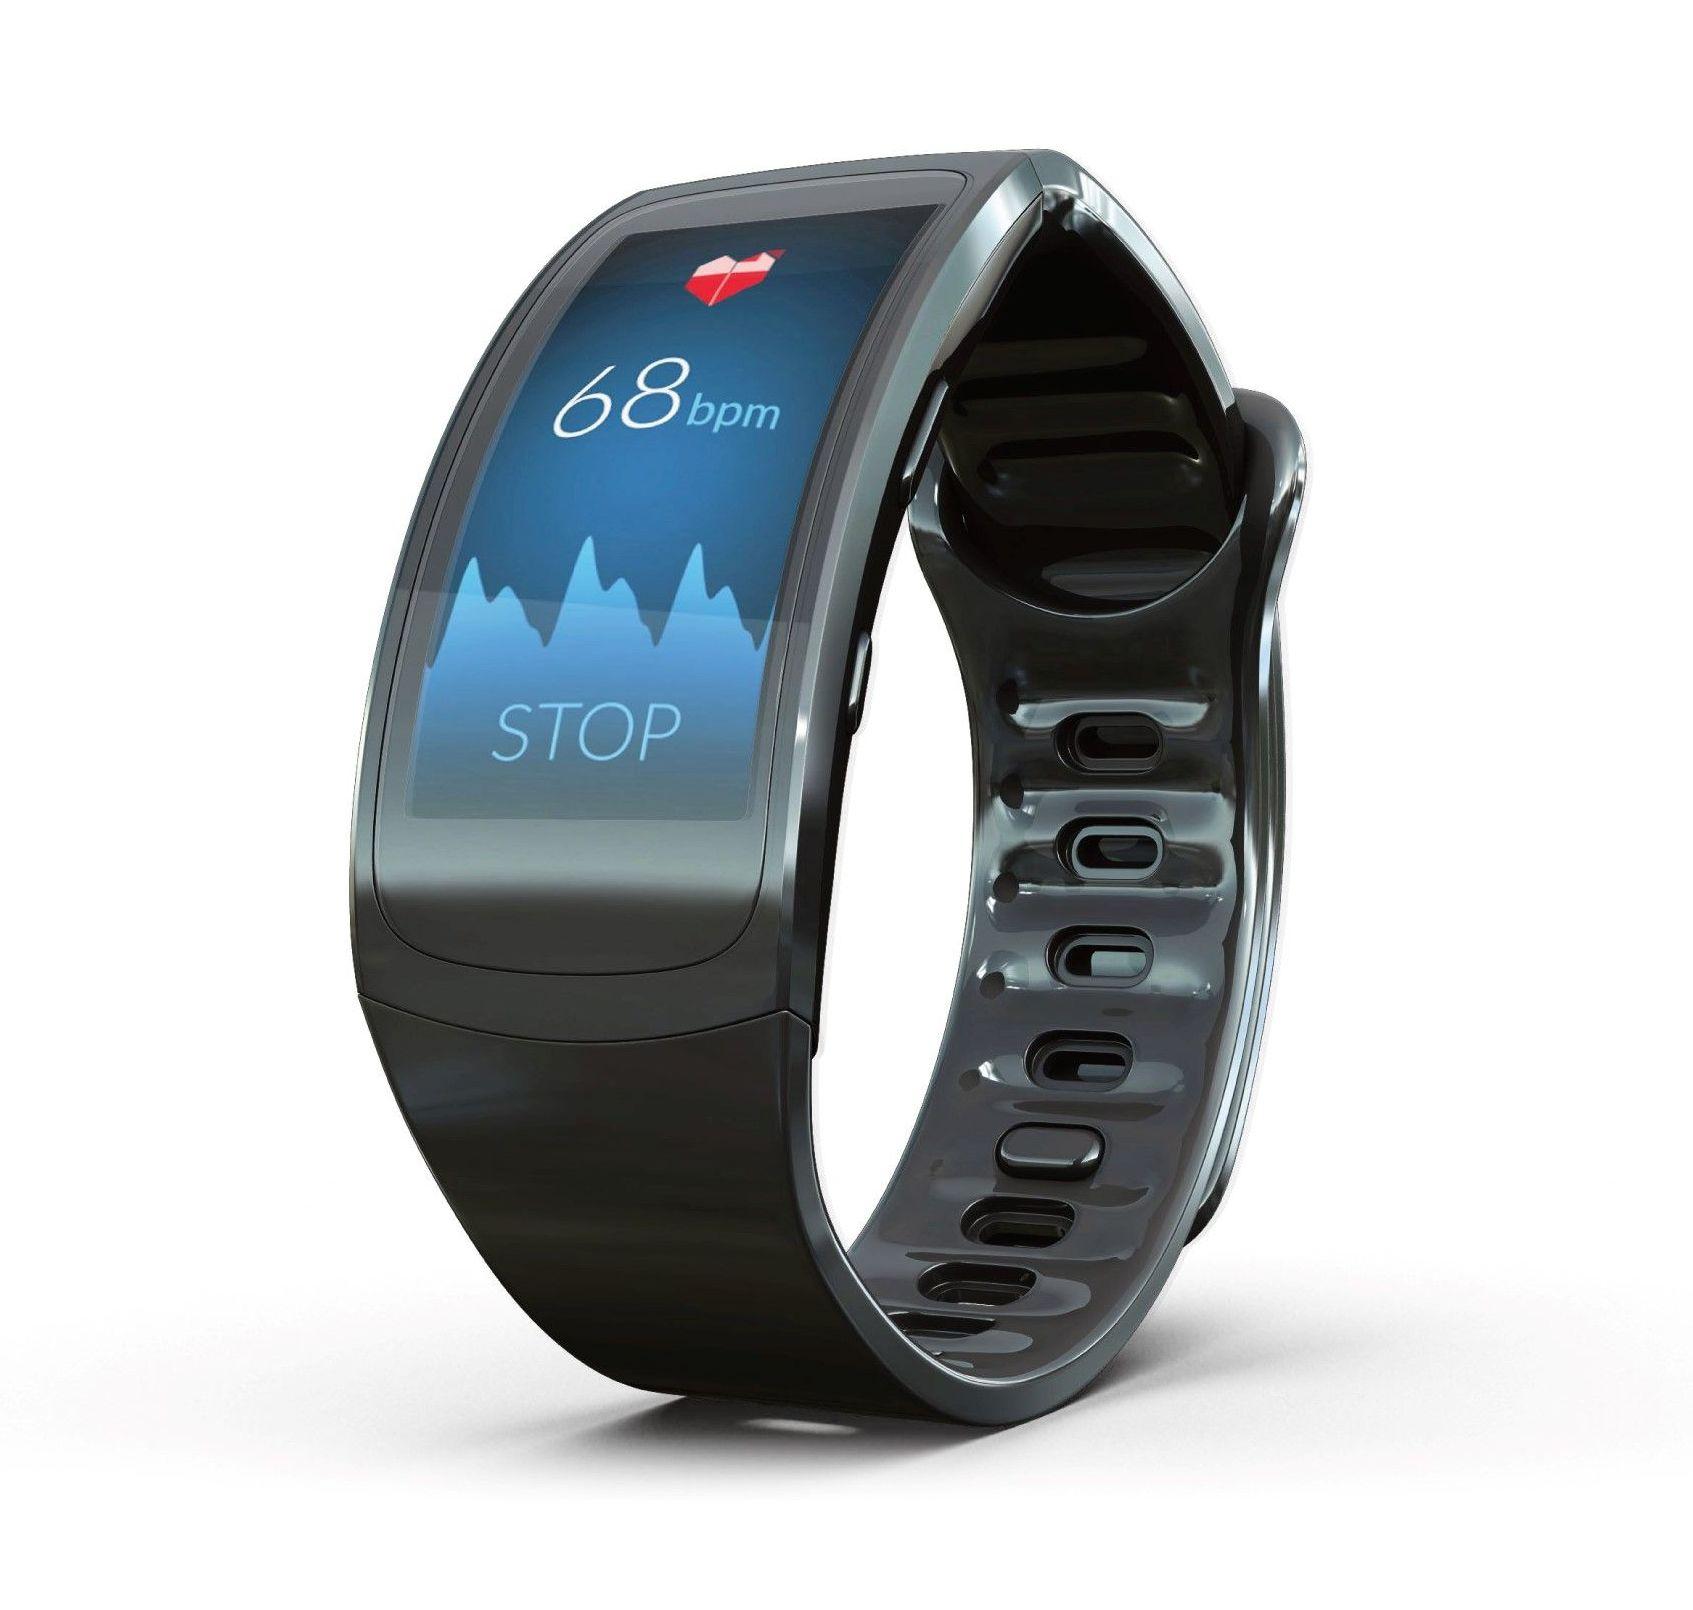 Smartwatch accurately detects atrial fibrillation: DZHK